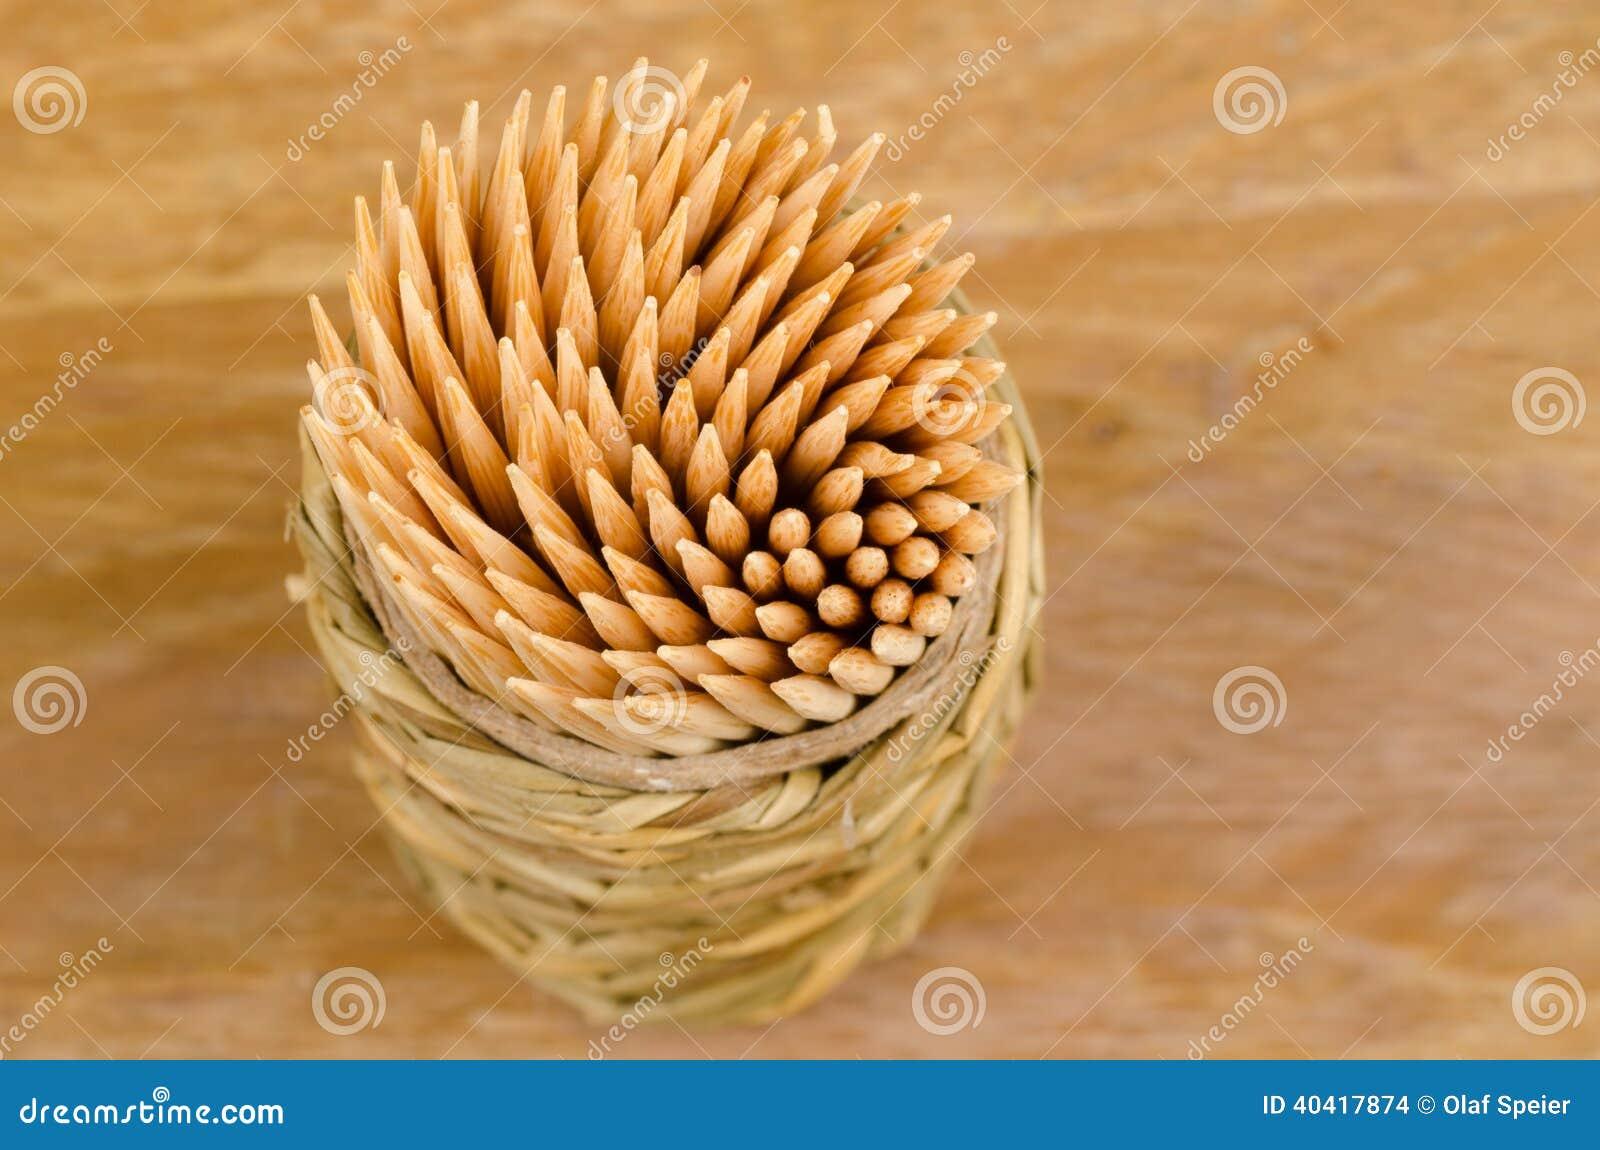 View of toothpicks